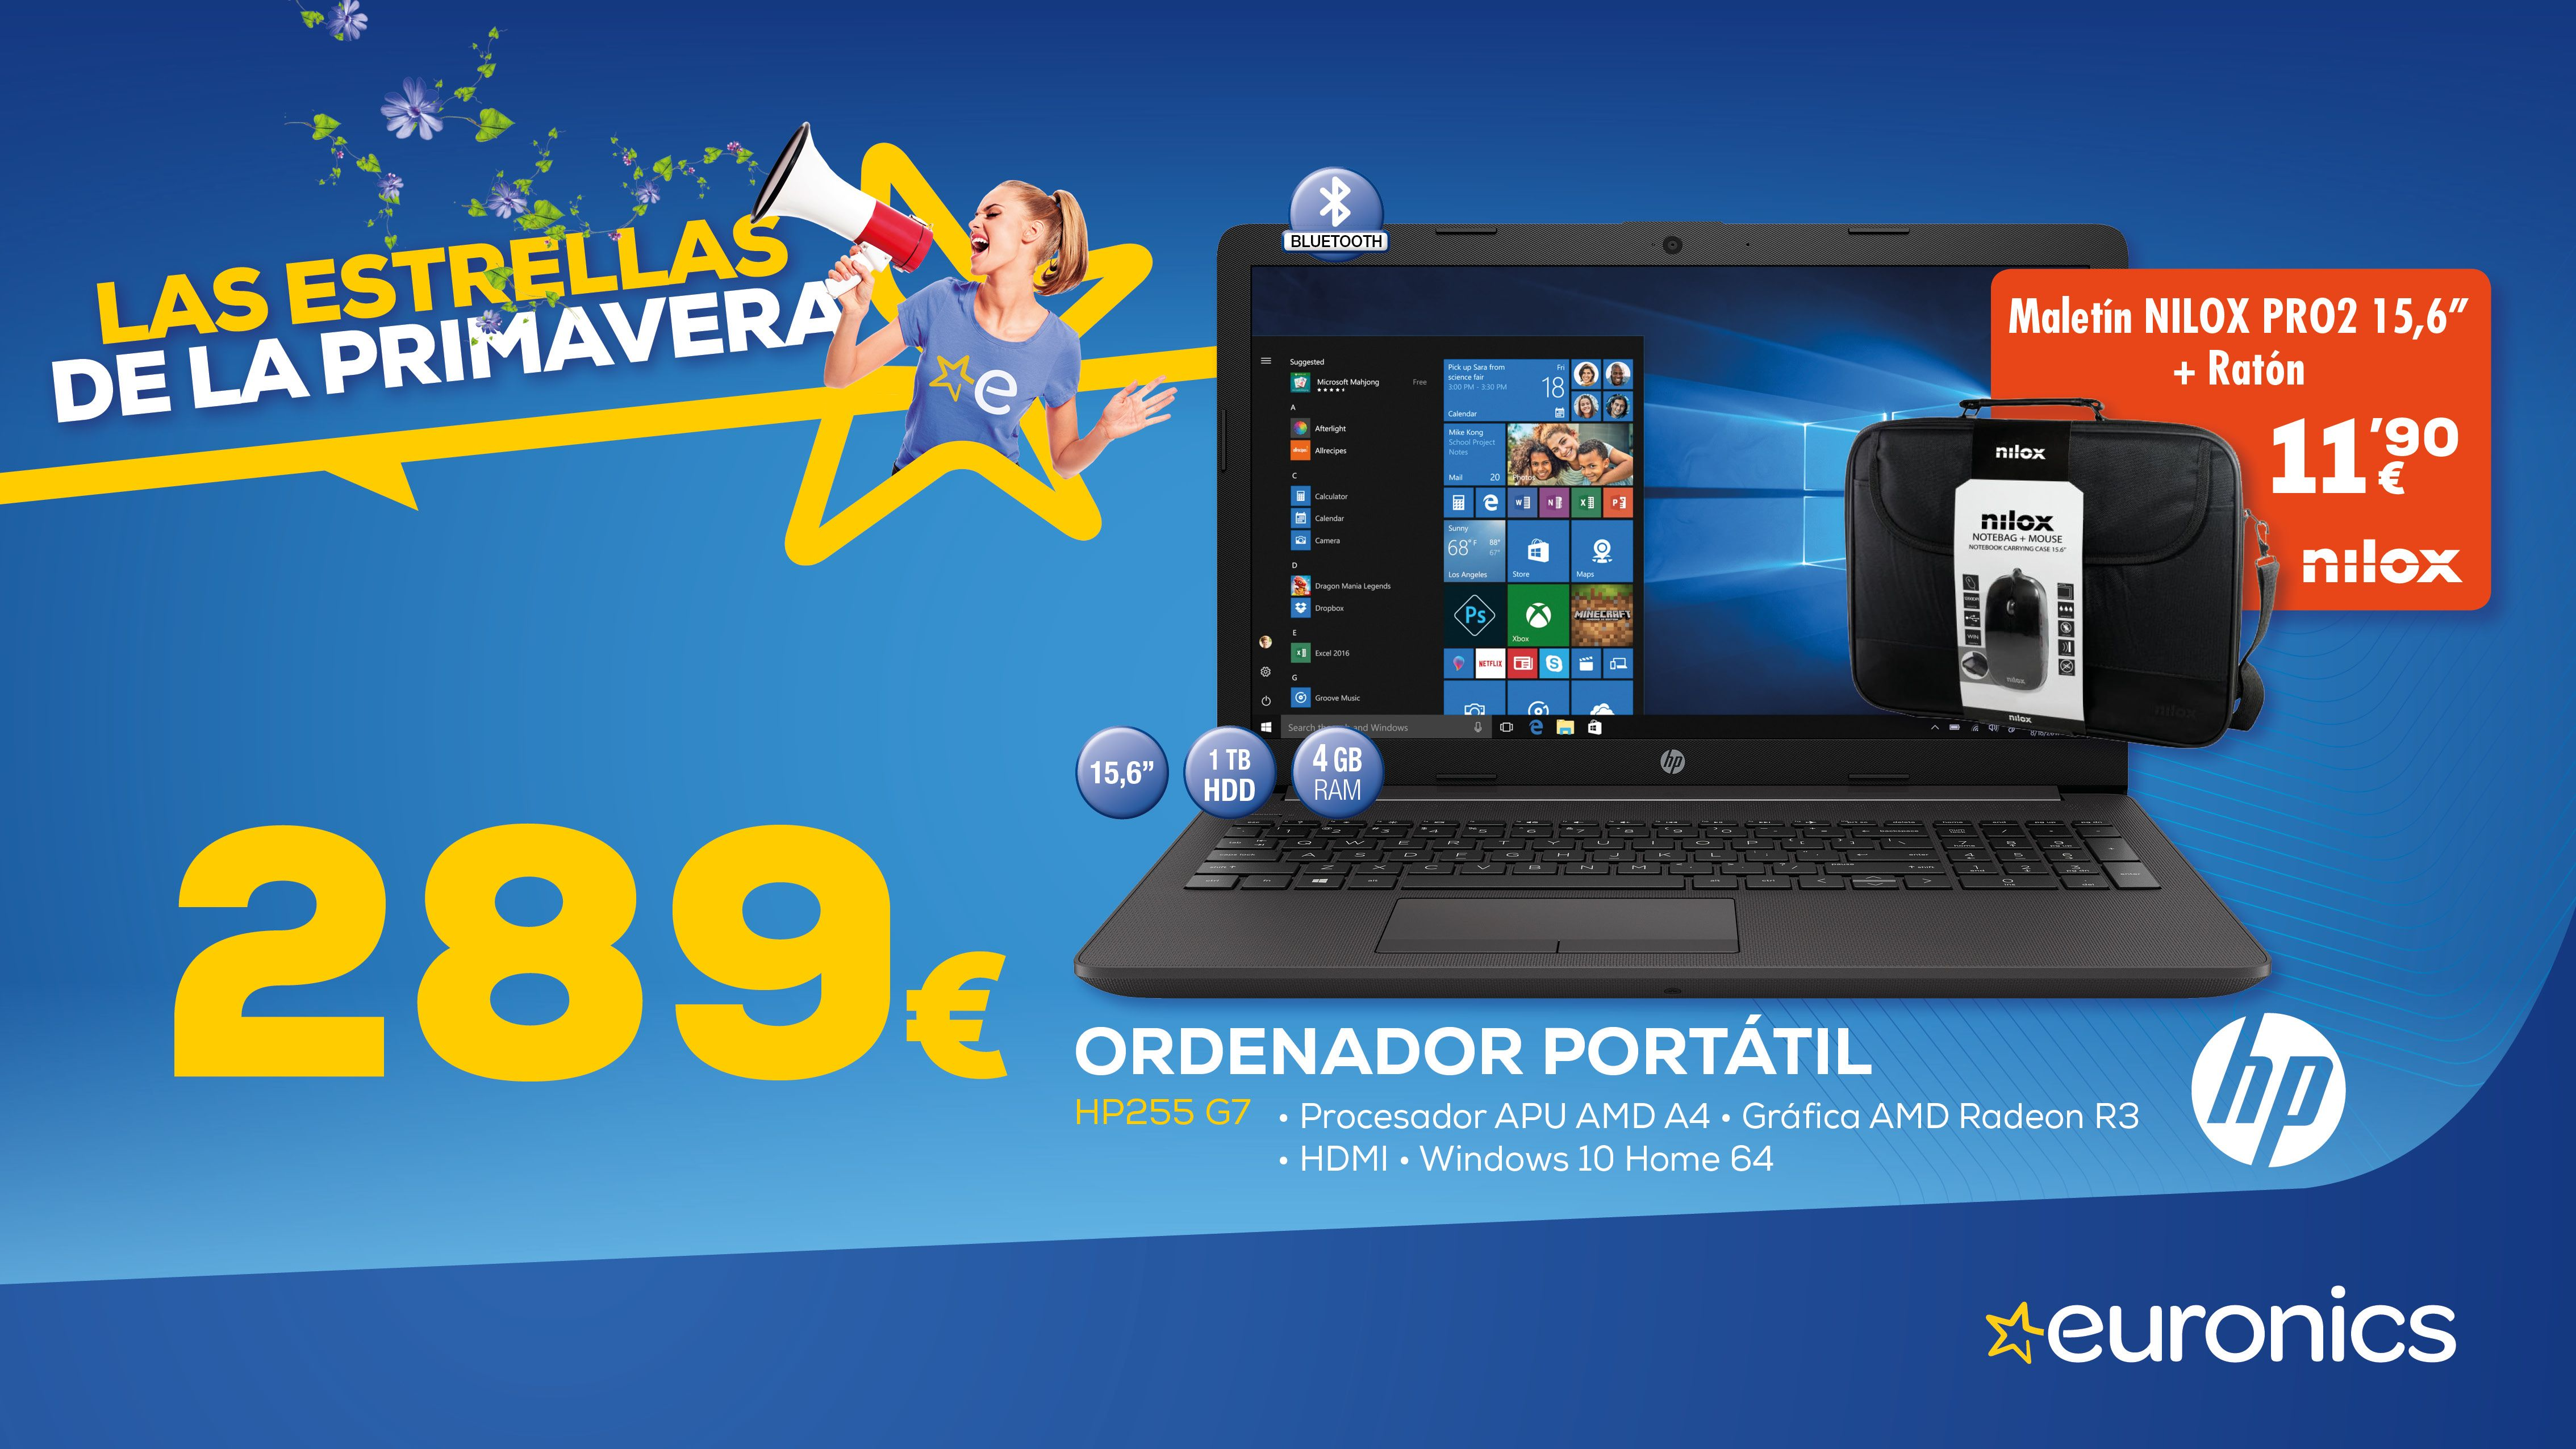 Ordenador portátil HP 289€